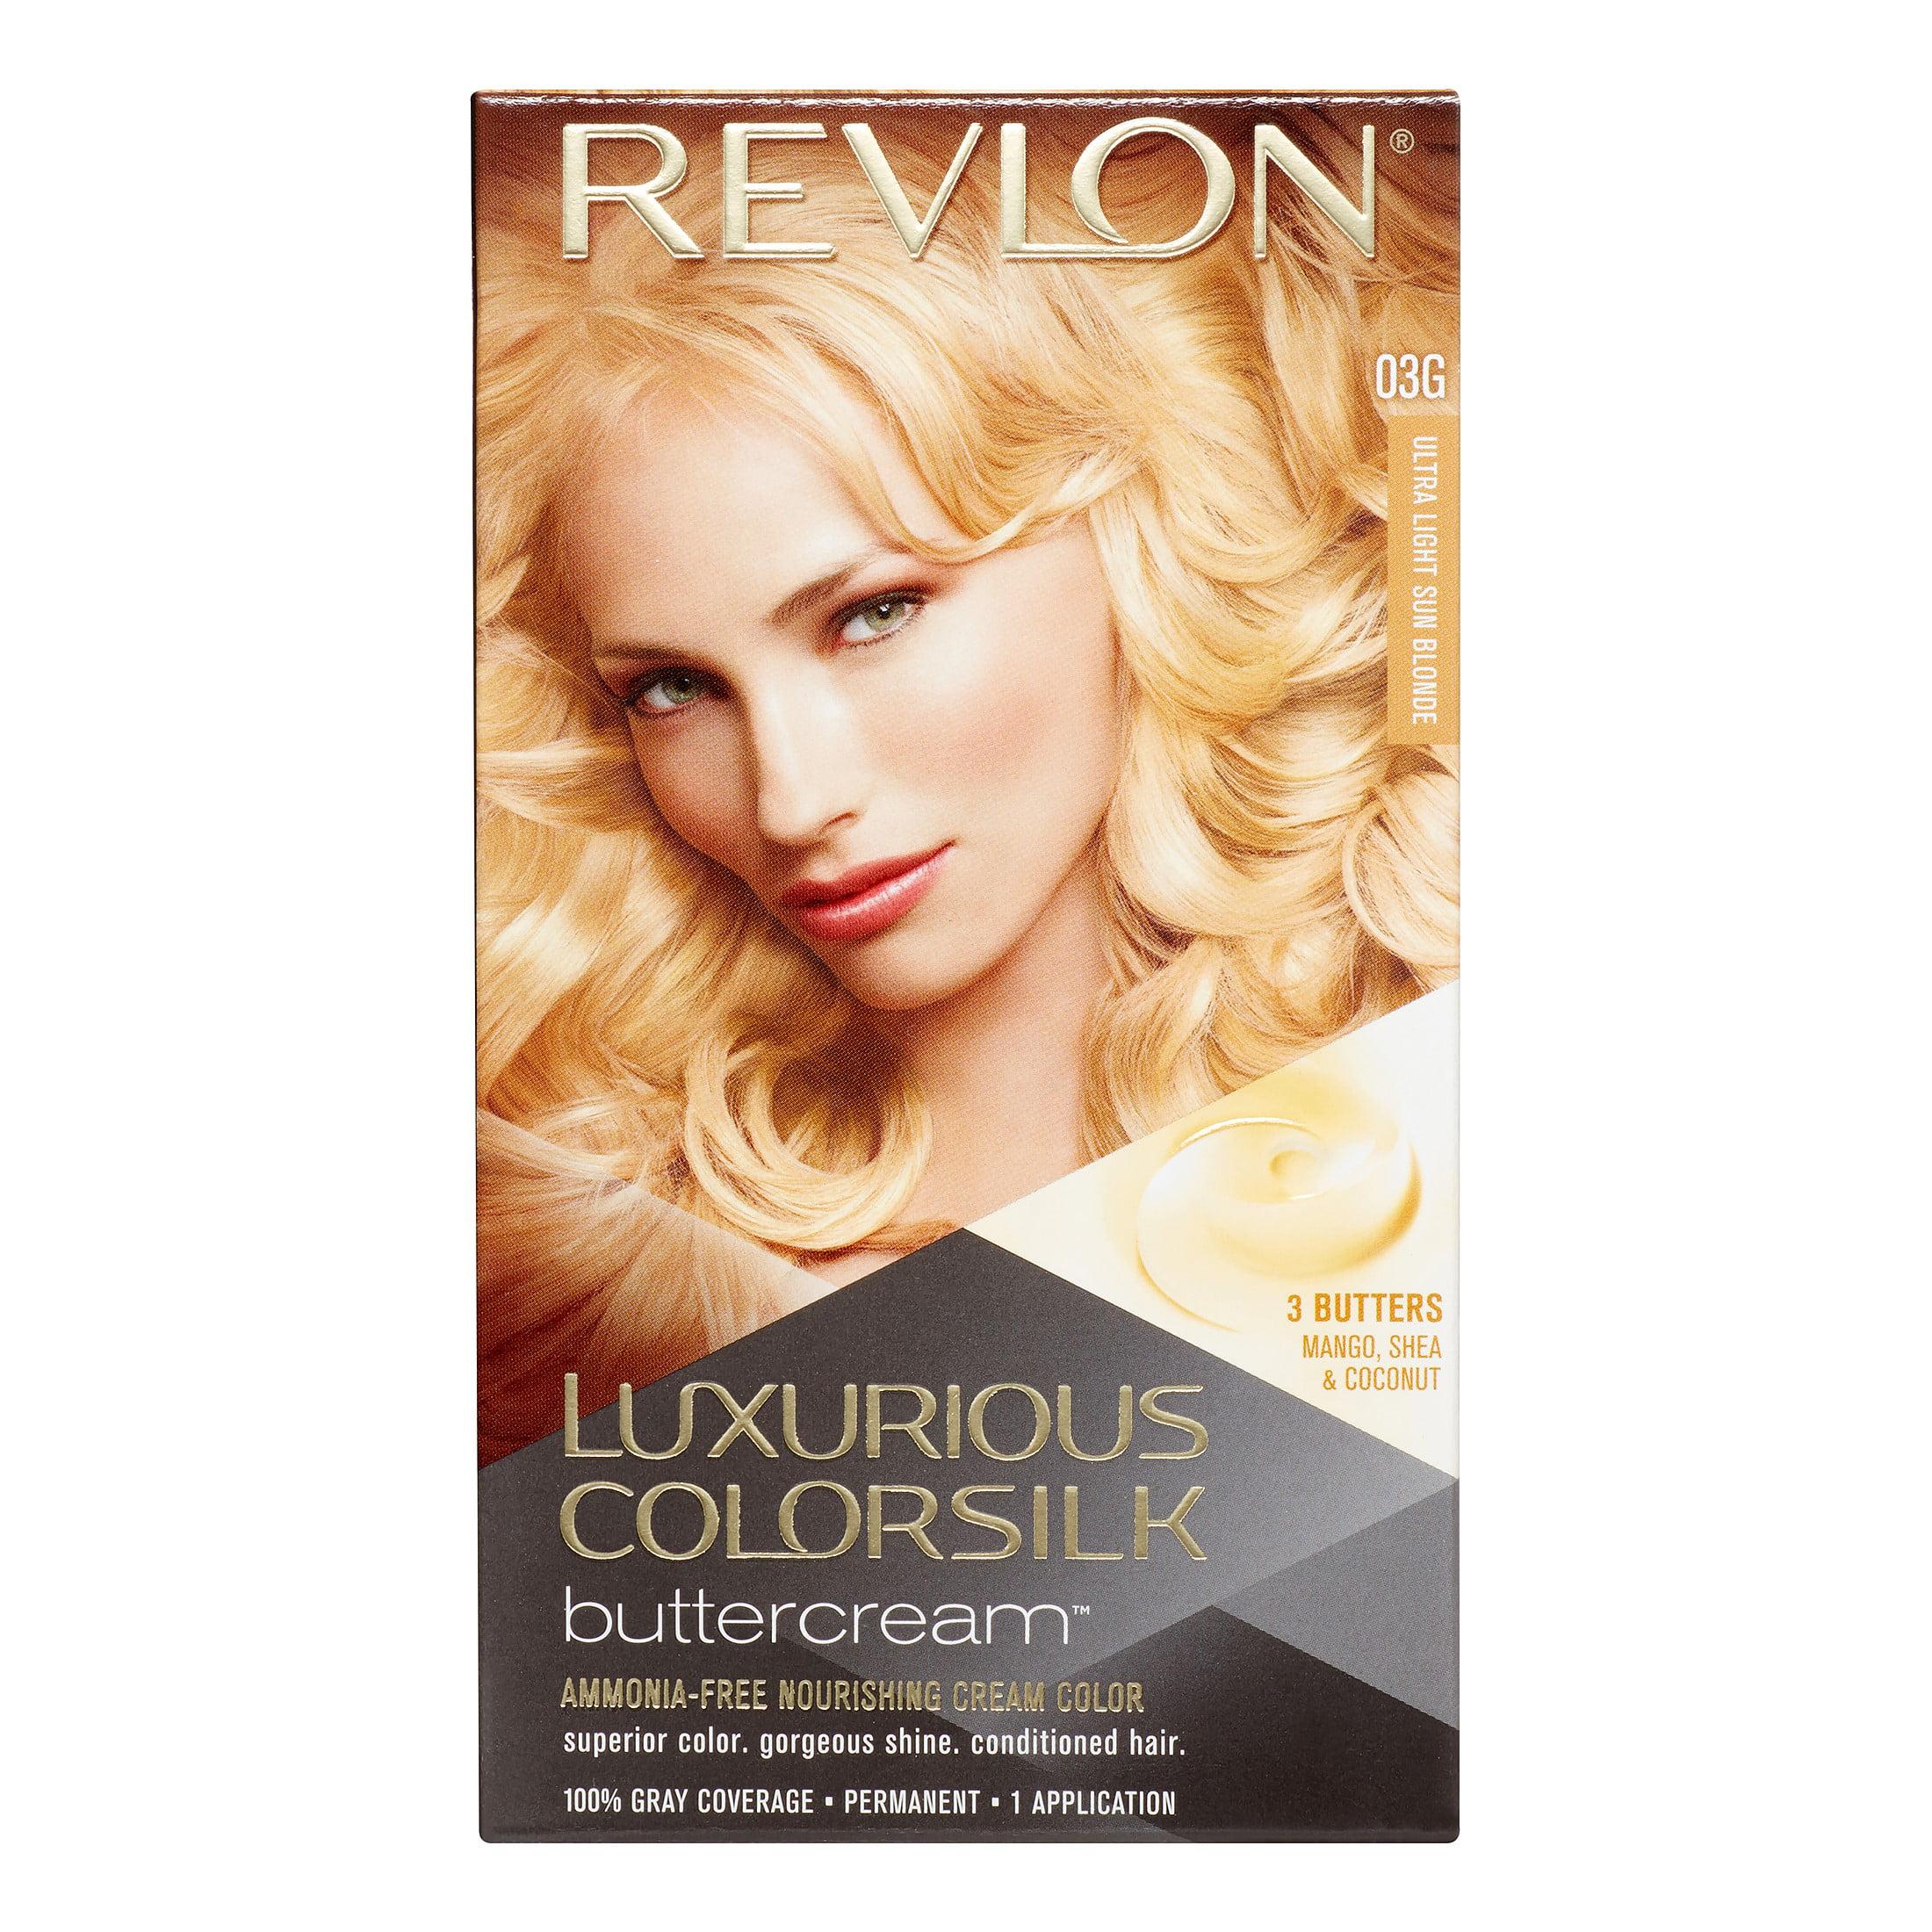 Revlon Luxurious Colorsilk Buttercream Hair Color Ultra Light Sun